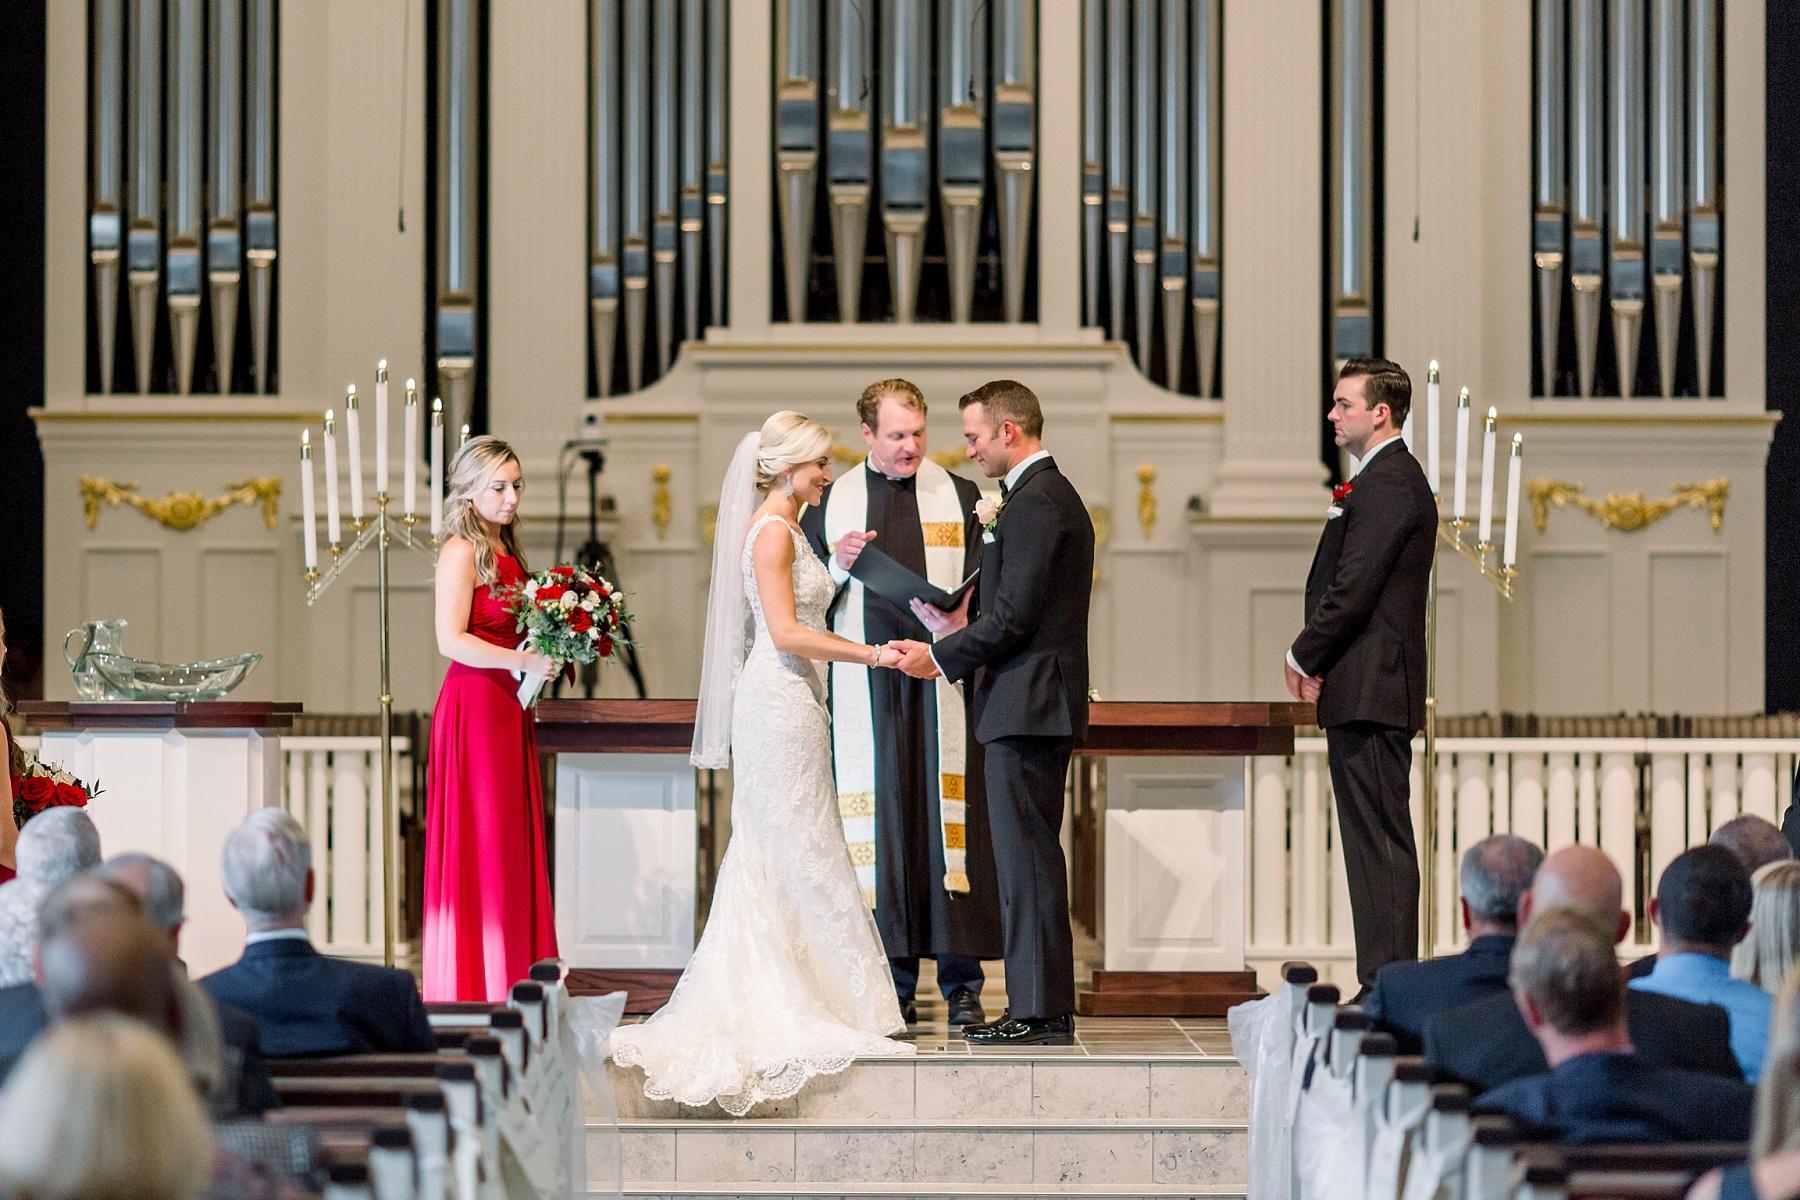 midwest-adventurous-wedding-photographer-elizabeth-ladean-photography-photo_4771.jpg